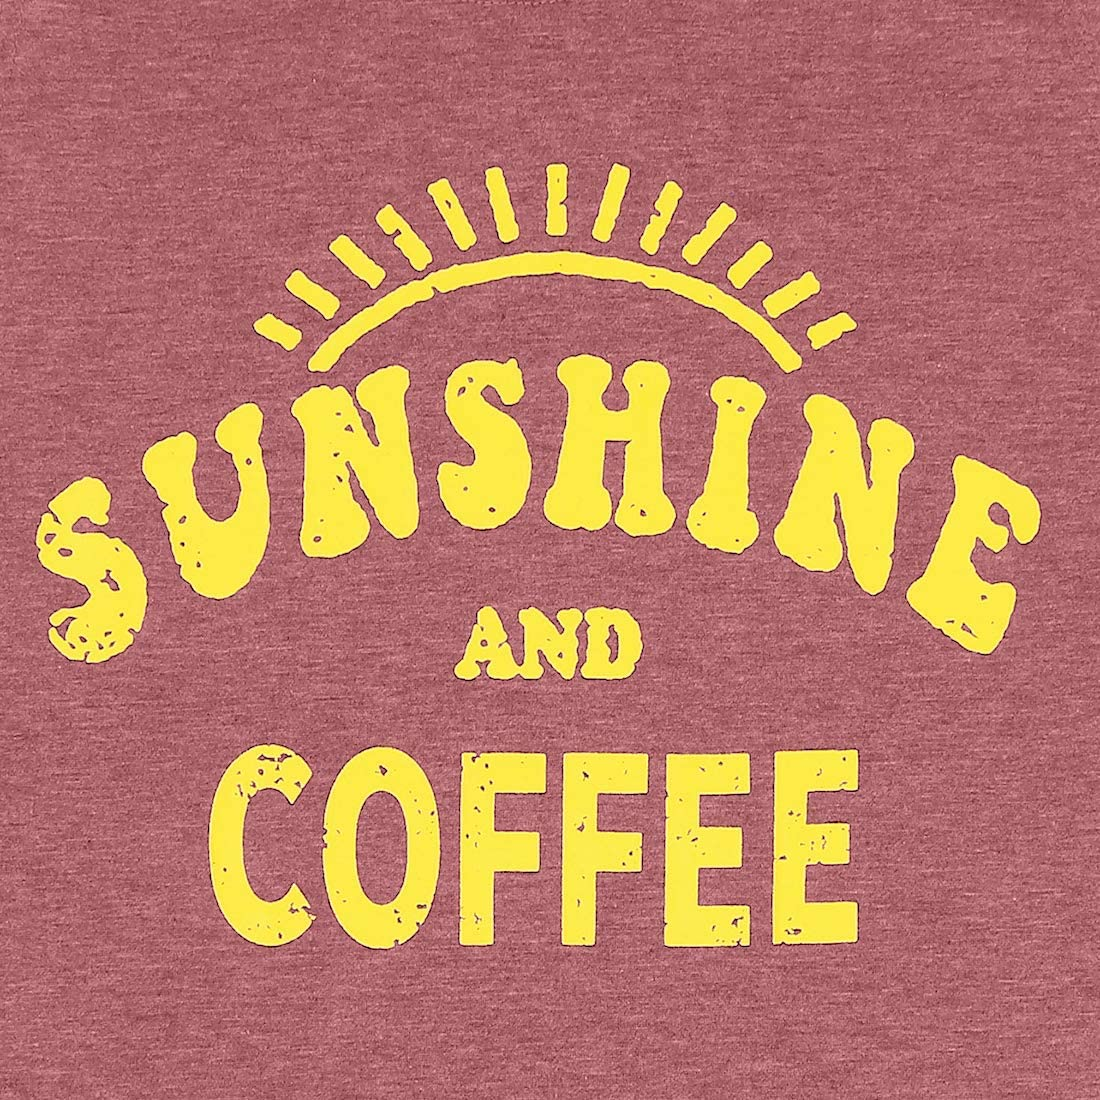 KIDDAD Tank Tops for Women Sunshine and Coffee Tank Top Funny Letter Print Vest Sleeveless T-Shirt Summer Tunic Shirt